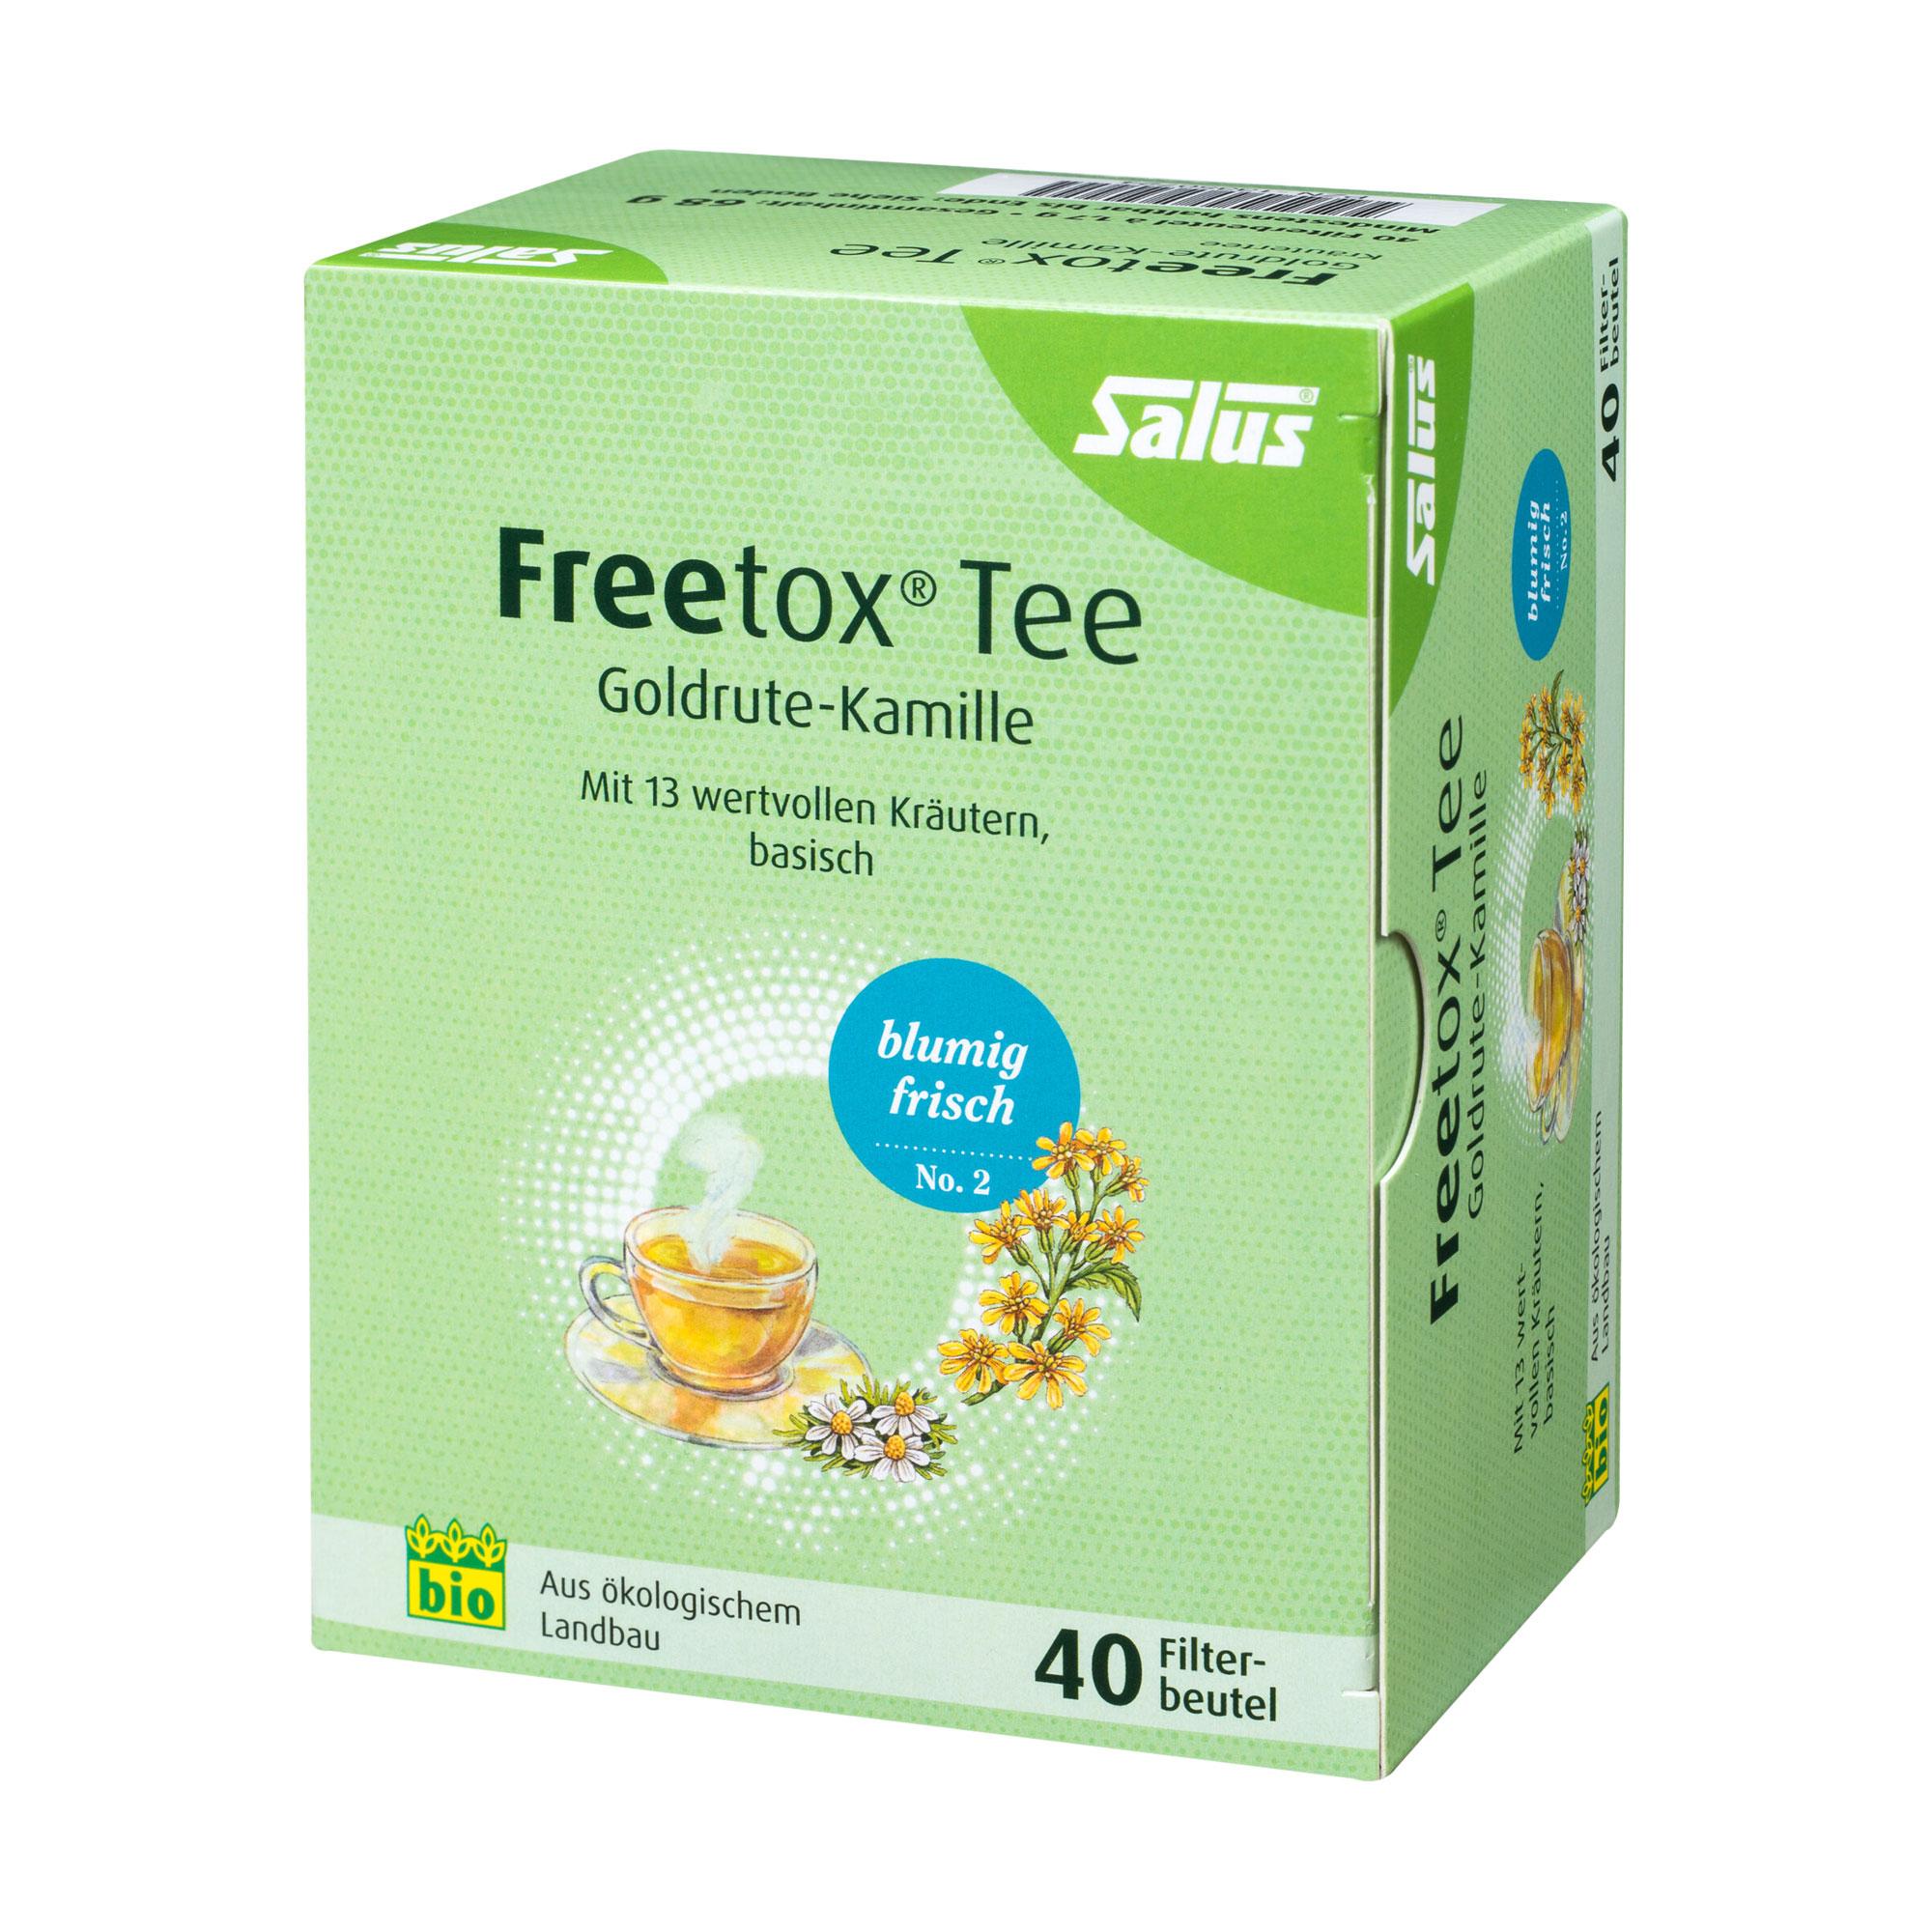 Freetox Tee Goldrute-Kamille Bio Filterbeutel